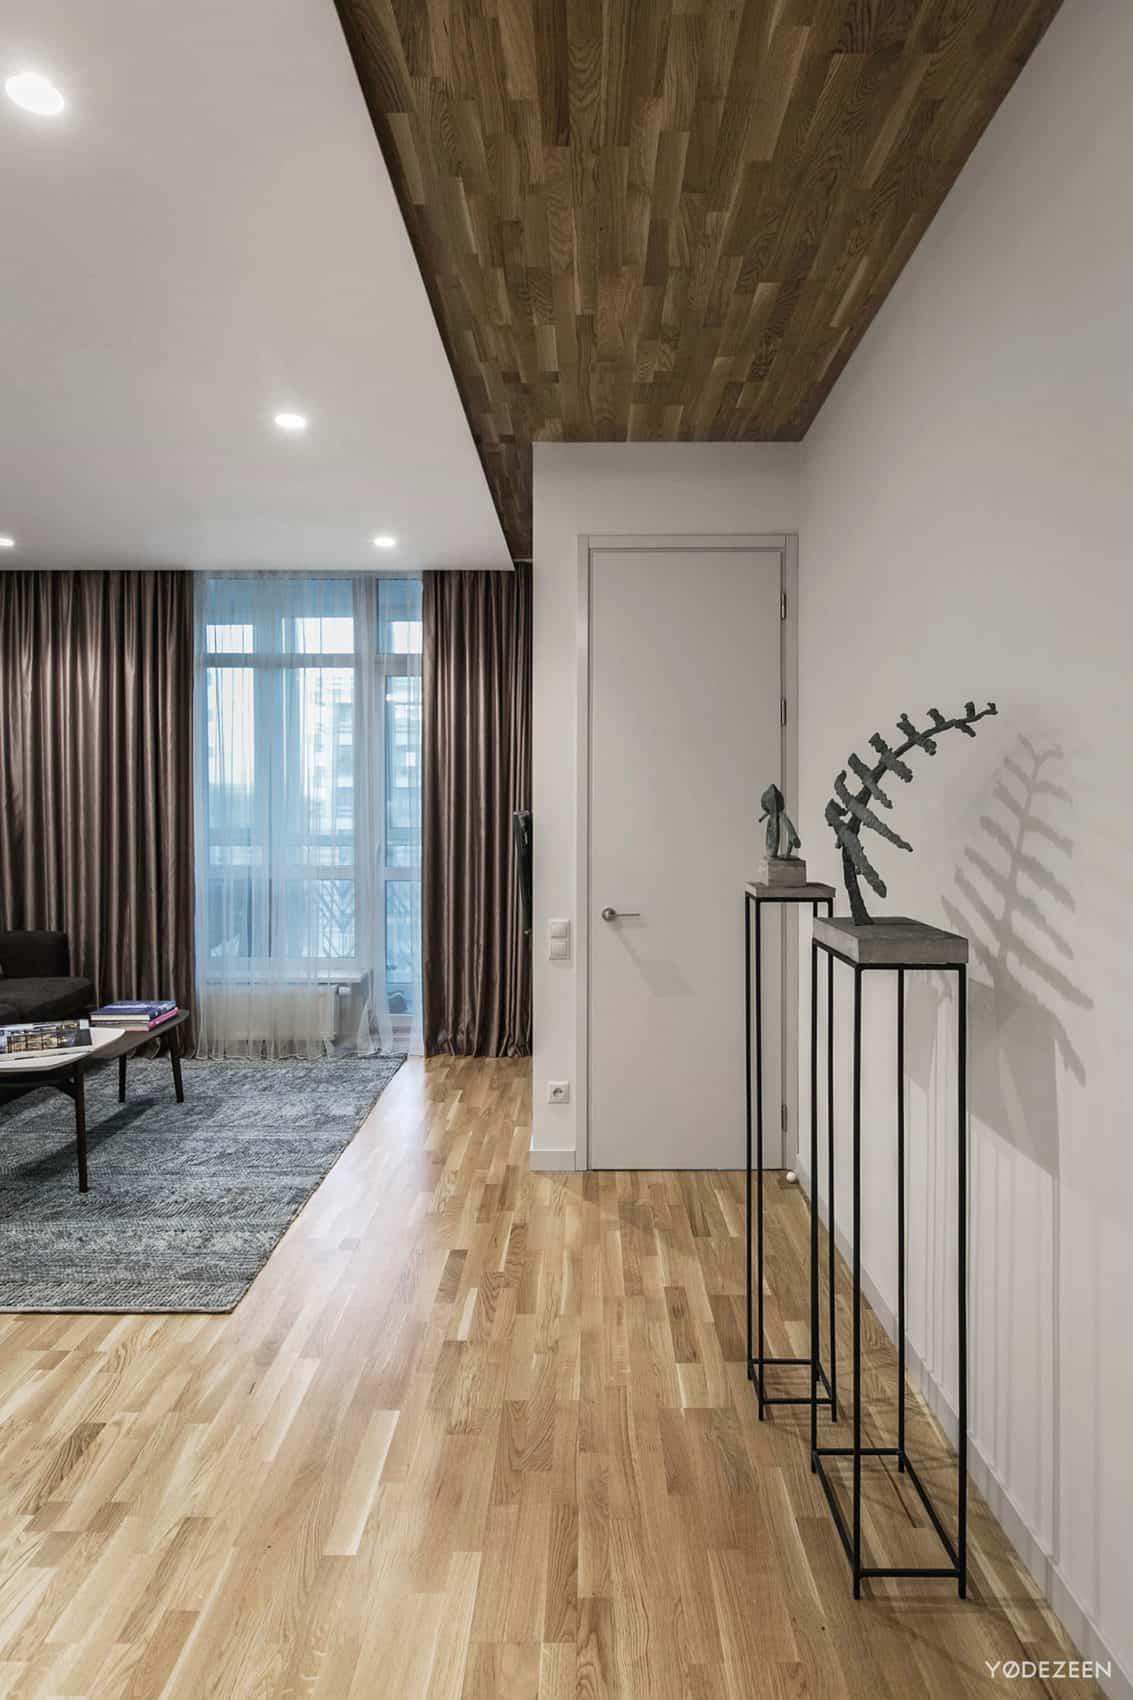 Apartment Kiev by YoDezeen (2)